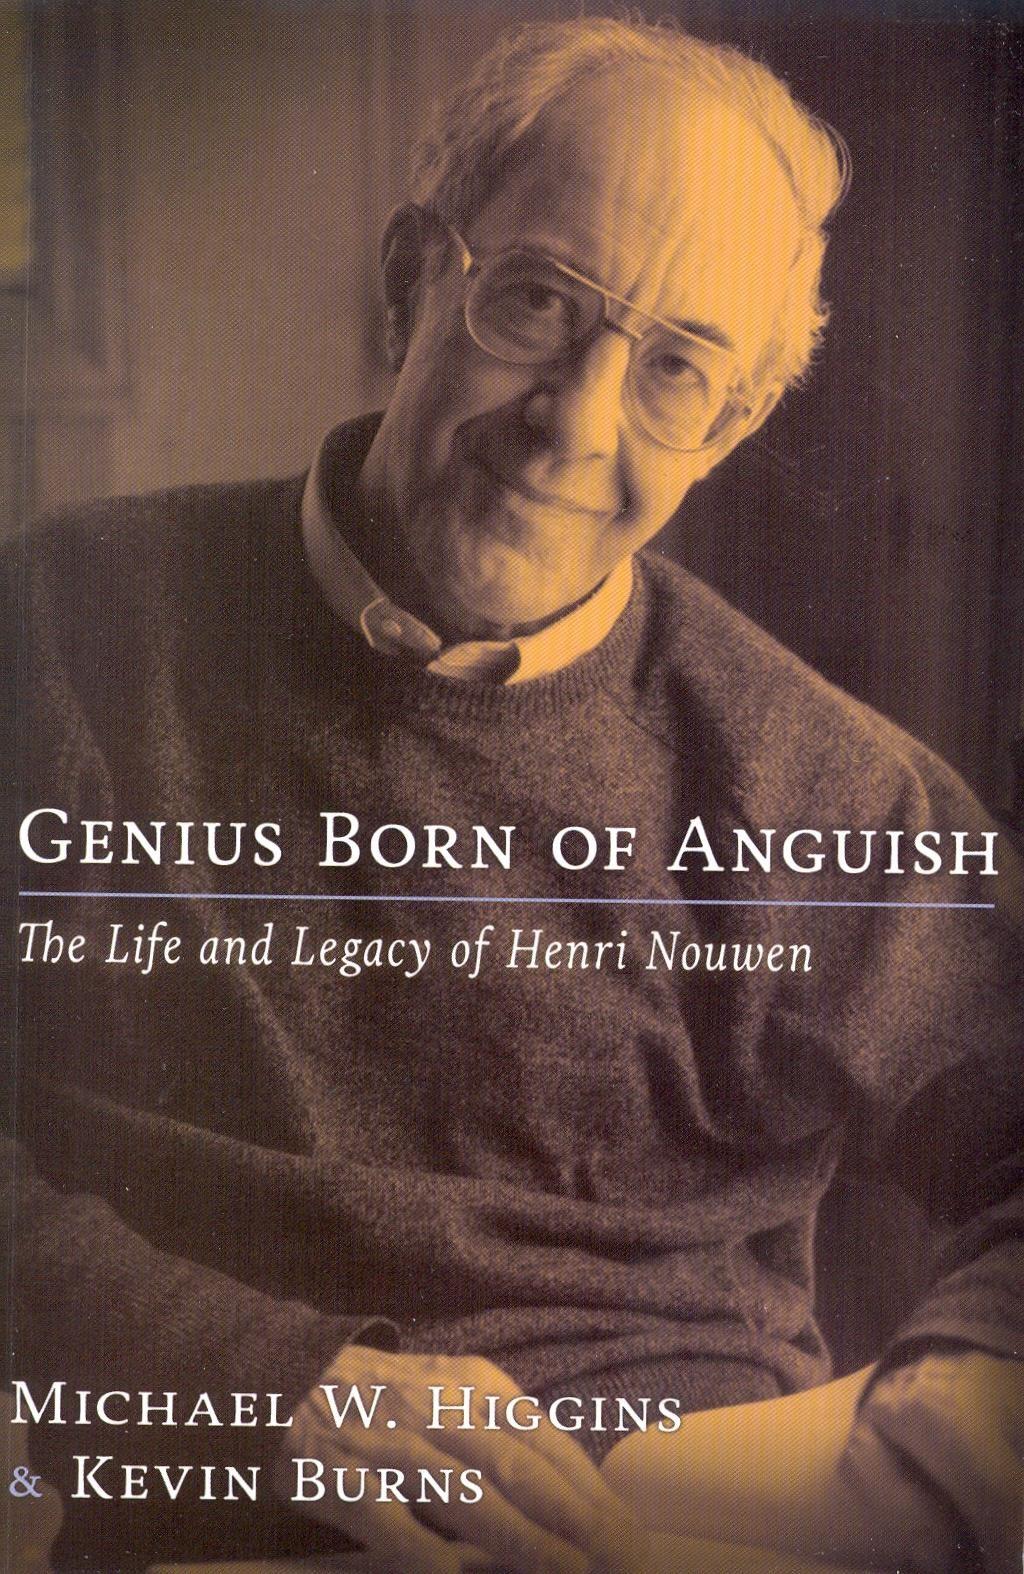 Quotes by Henri Nouwen @ Like Success Henri Nouwen